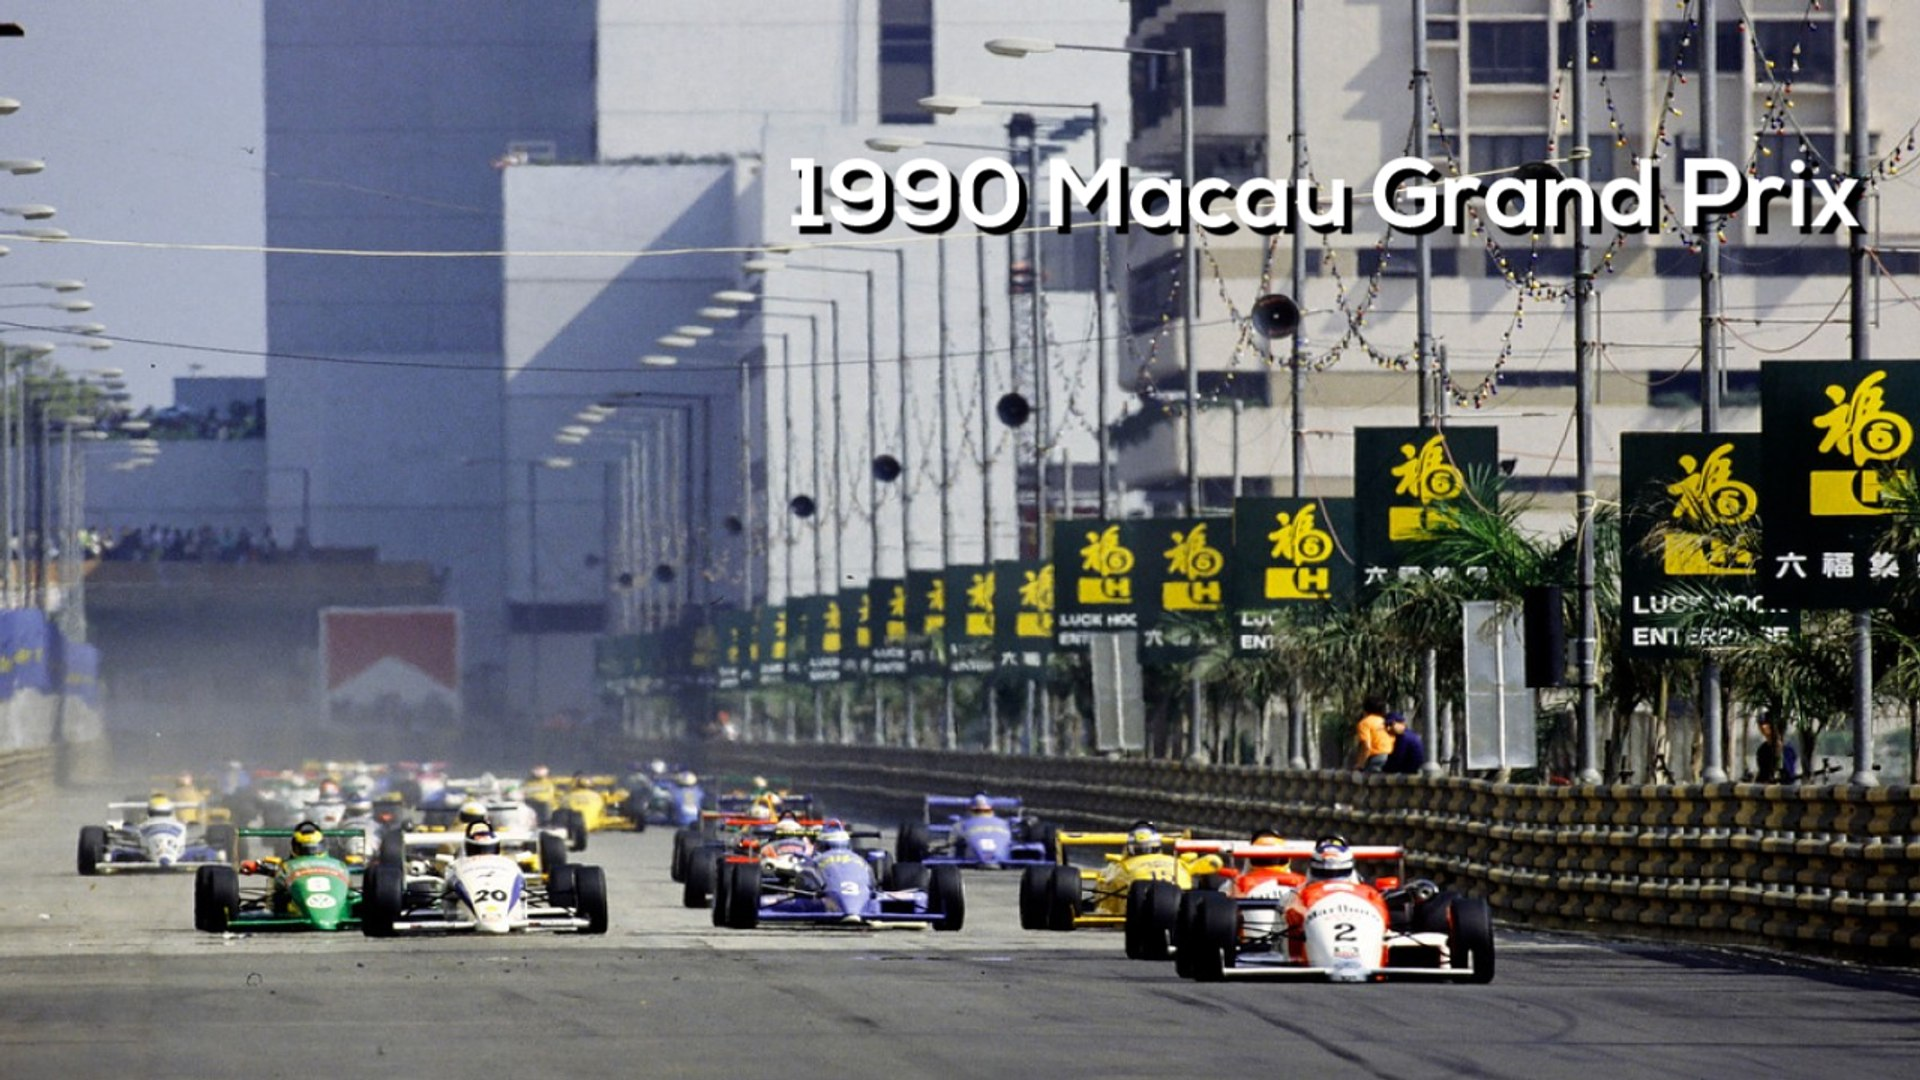 1990 Grande Premio de Macau | 1990 Macau Grand Prix - All 2 Races